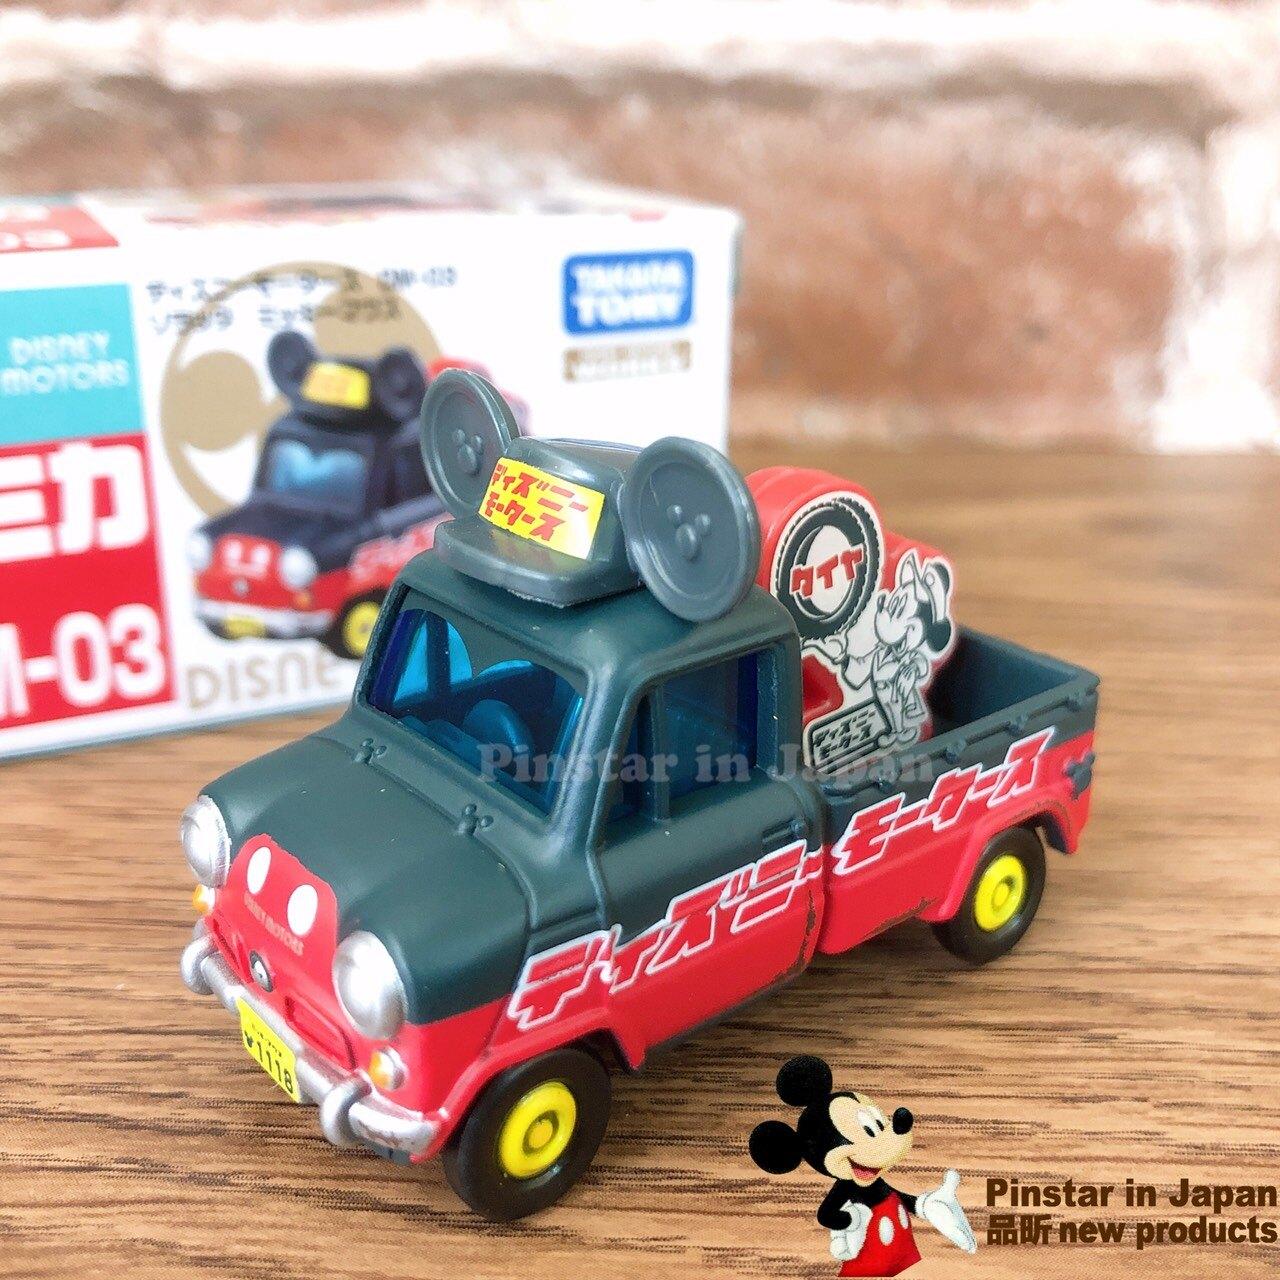 18080200016 TOMY工具車-DM03米奇小貨車 米奇 米老鼠 小貨車 tomica dm03 真愛日本